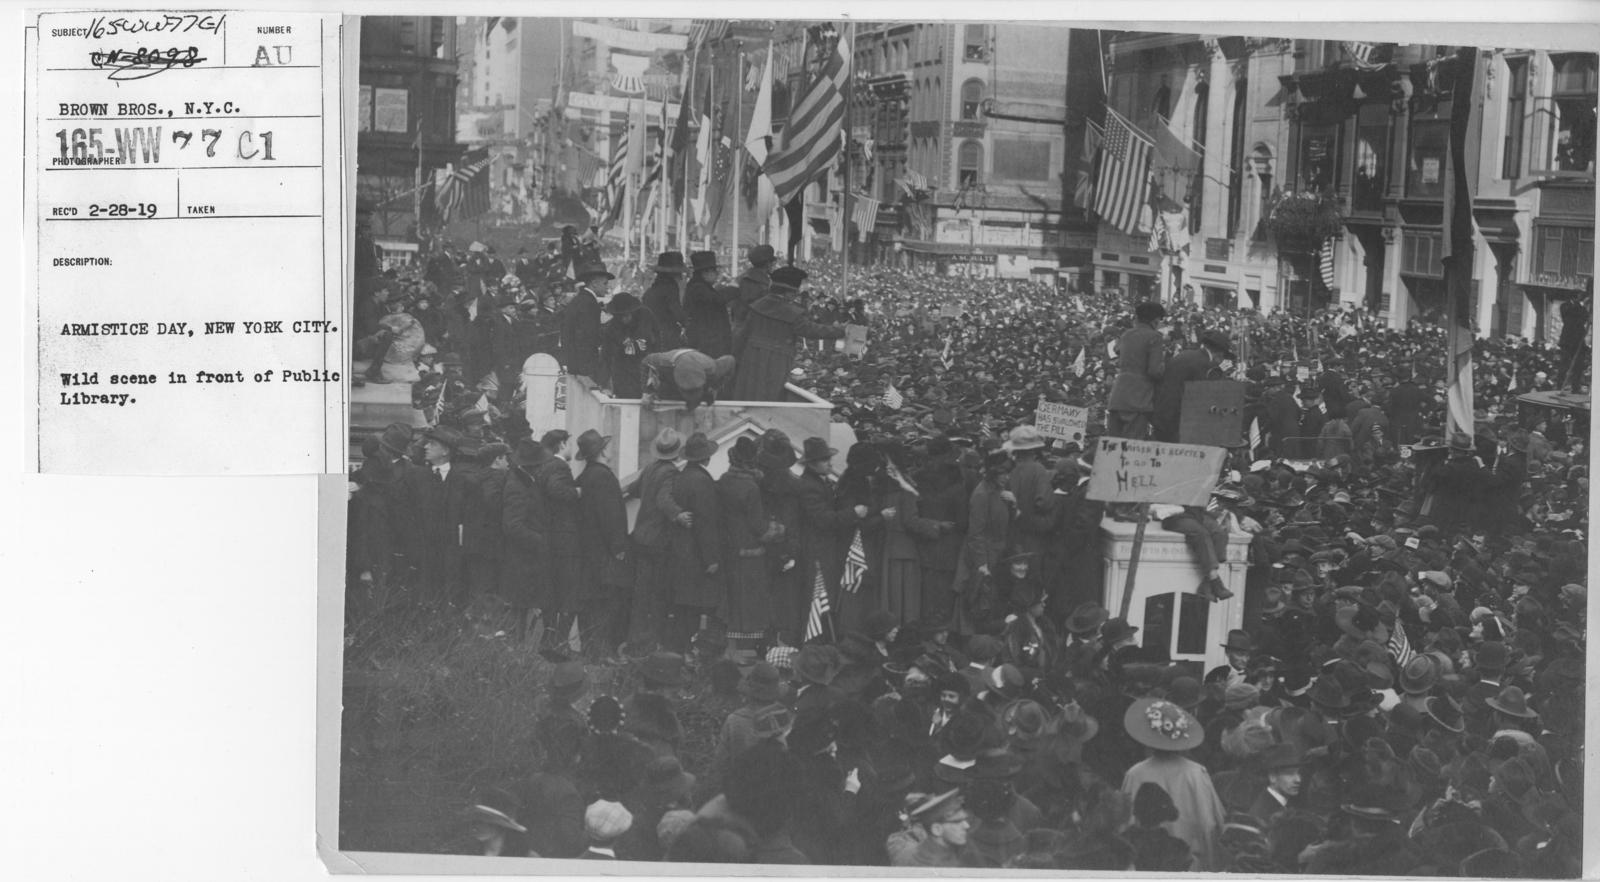 Ceremonies - New York City - Armistice Day, New York City. Wild scene in front of Public Library